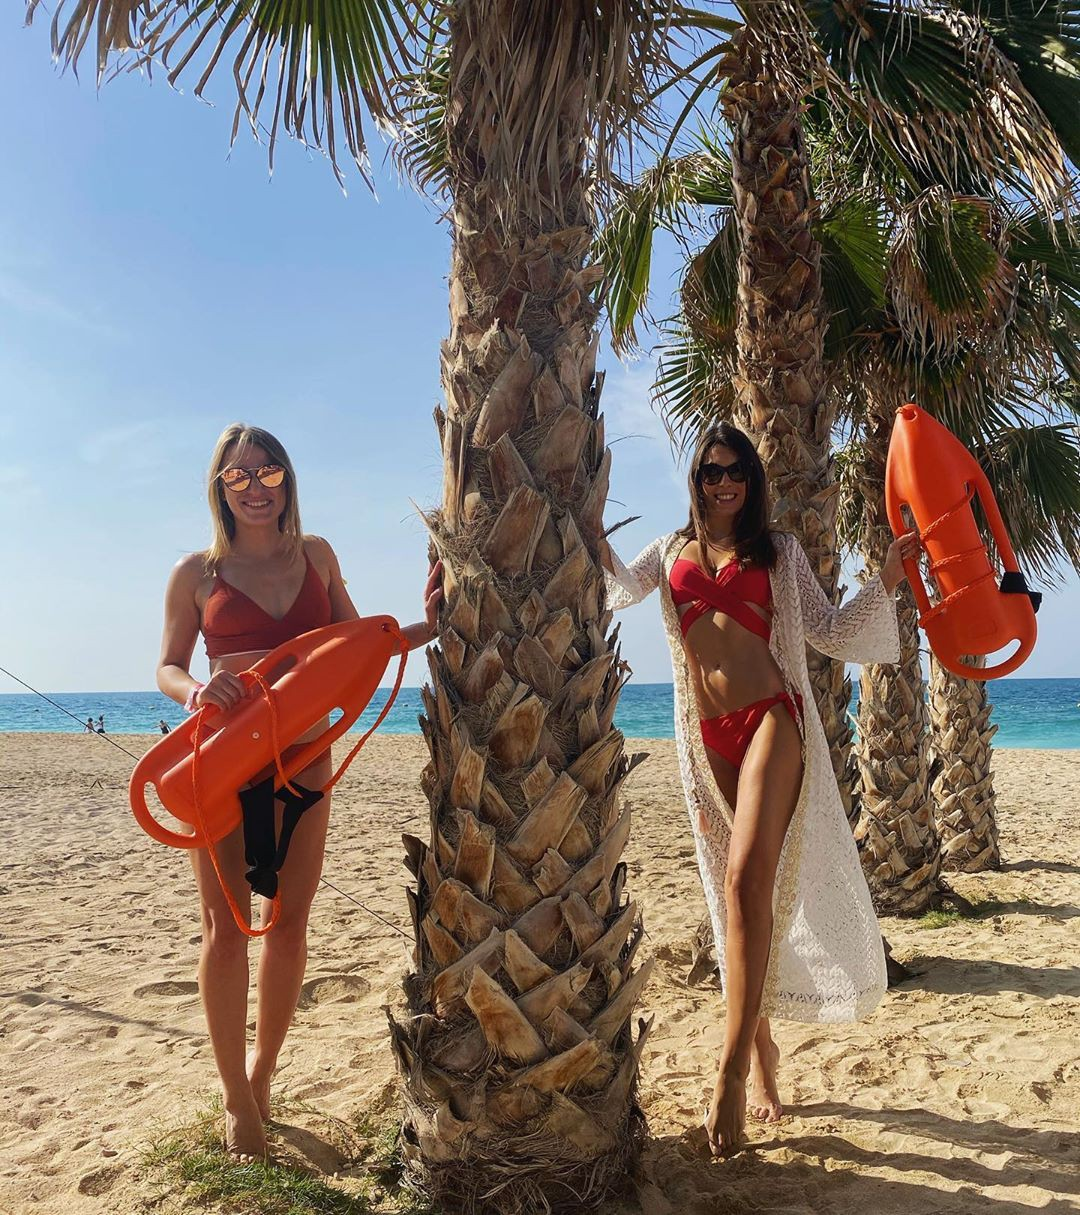 Stefanie Capshield bikini model swimwear colour outfit ideas 2020, fun pic